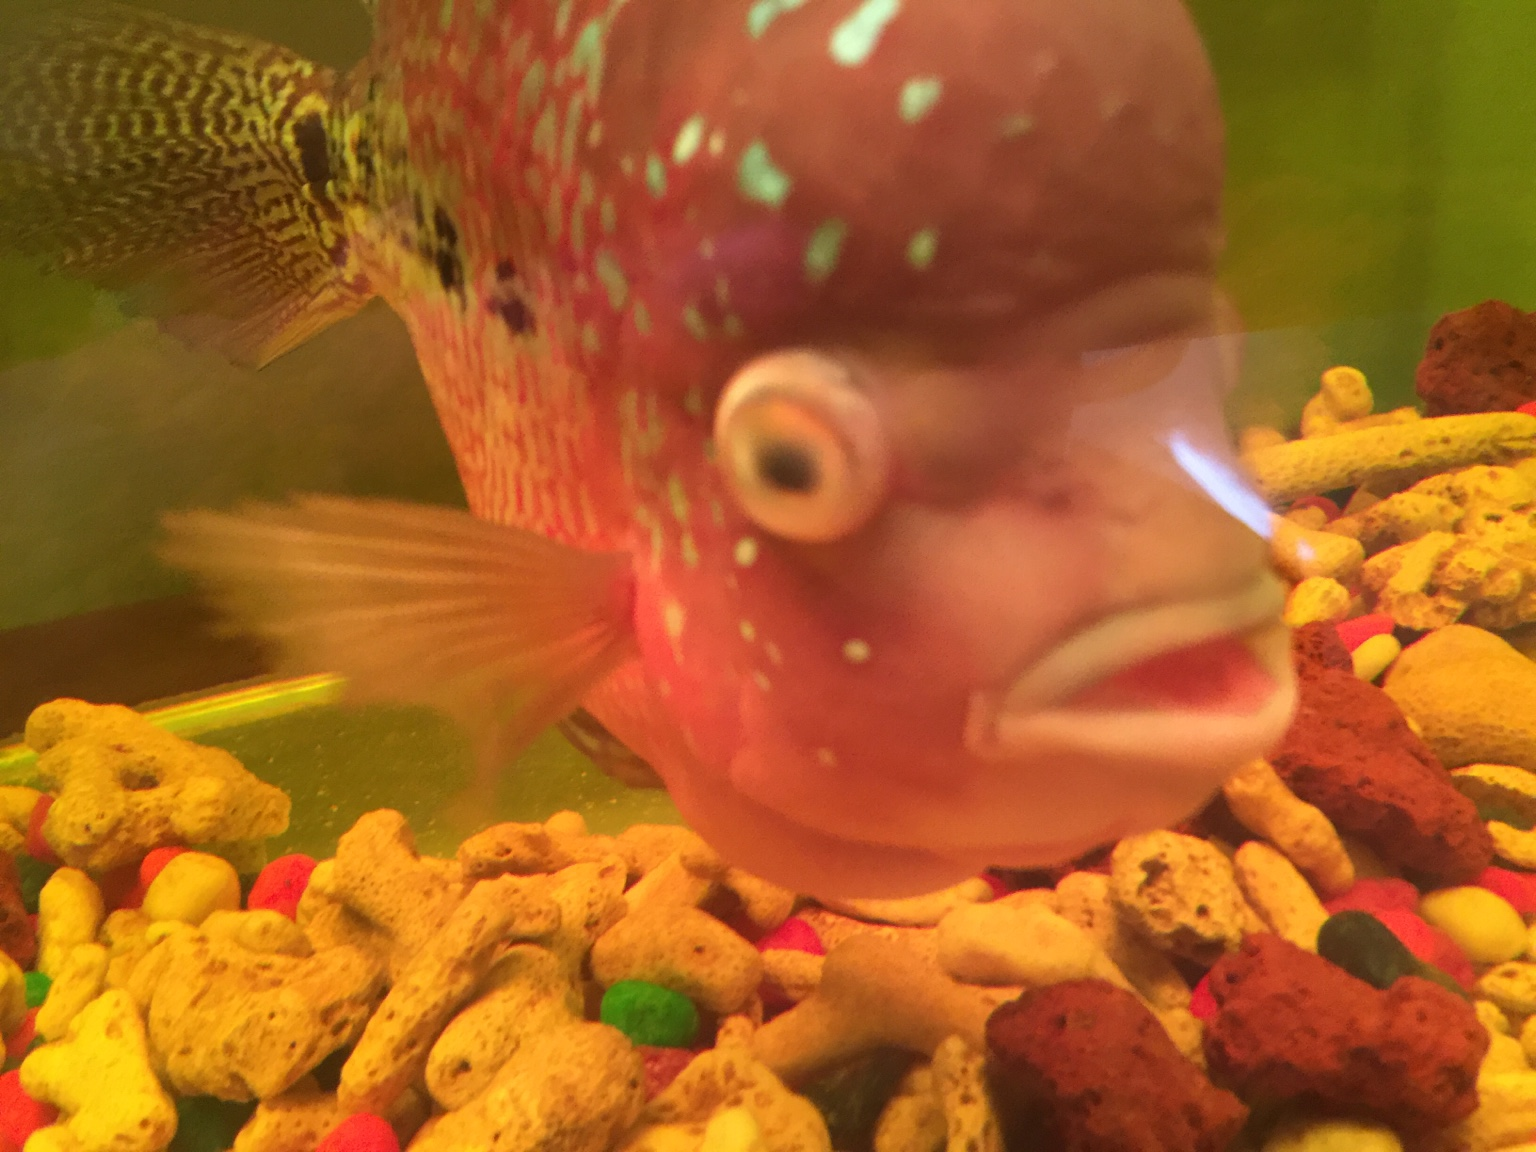 Freshwater fish cloudy eyes - Freshwater Fish Cloudy Eyes